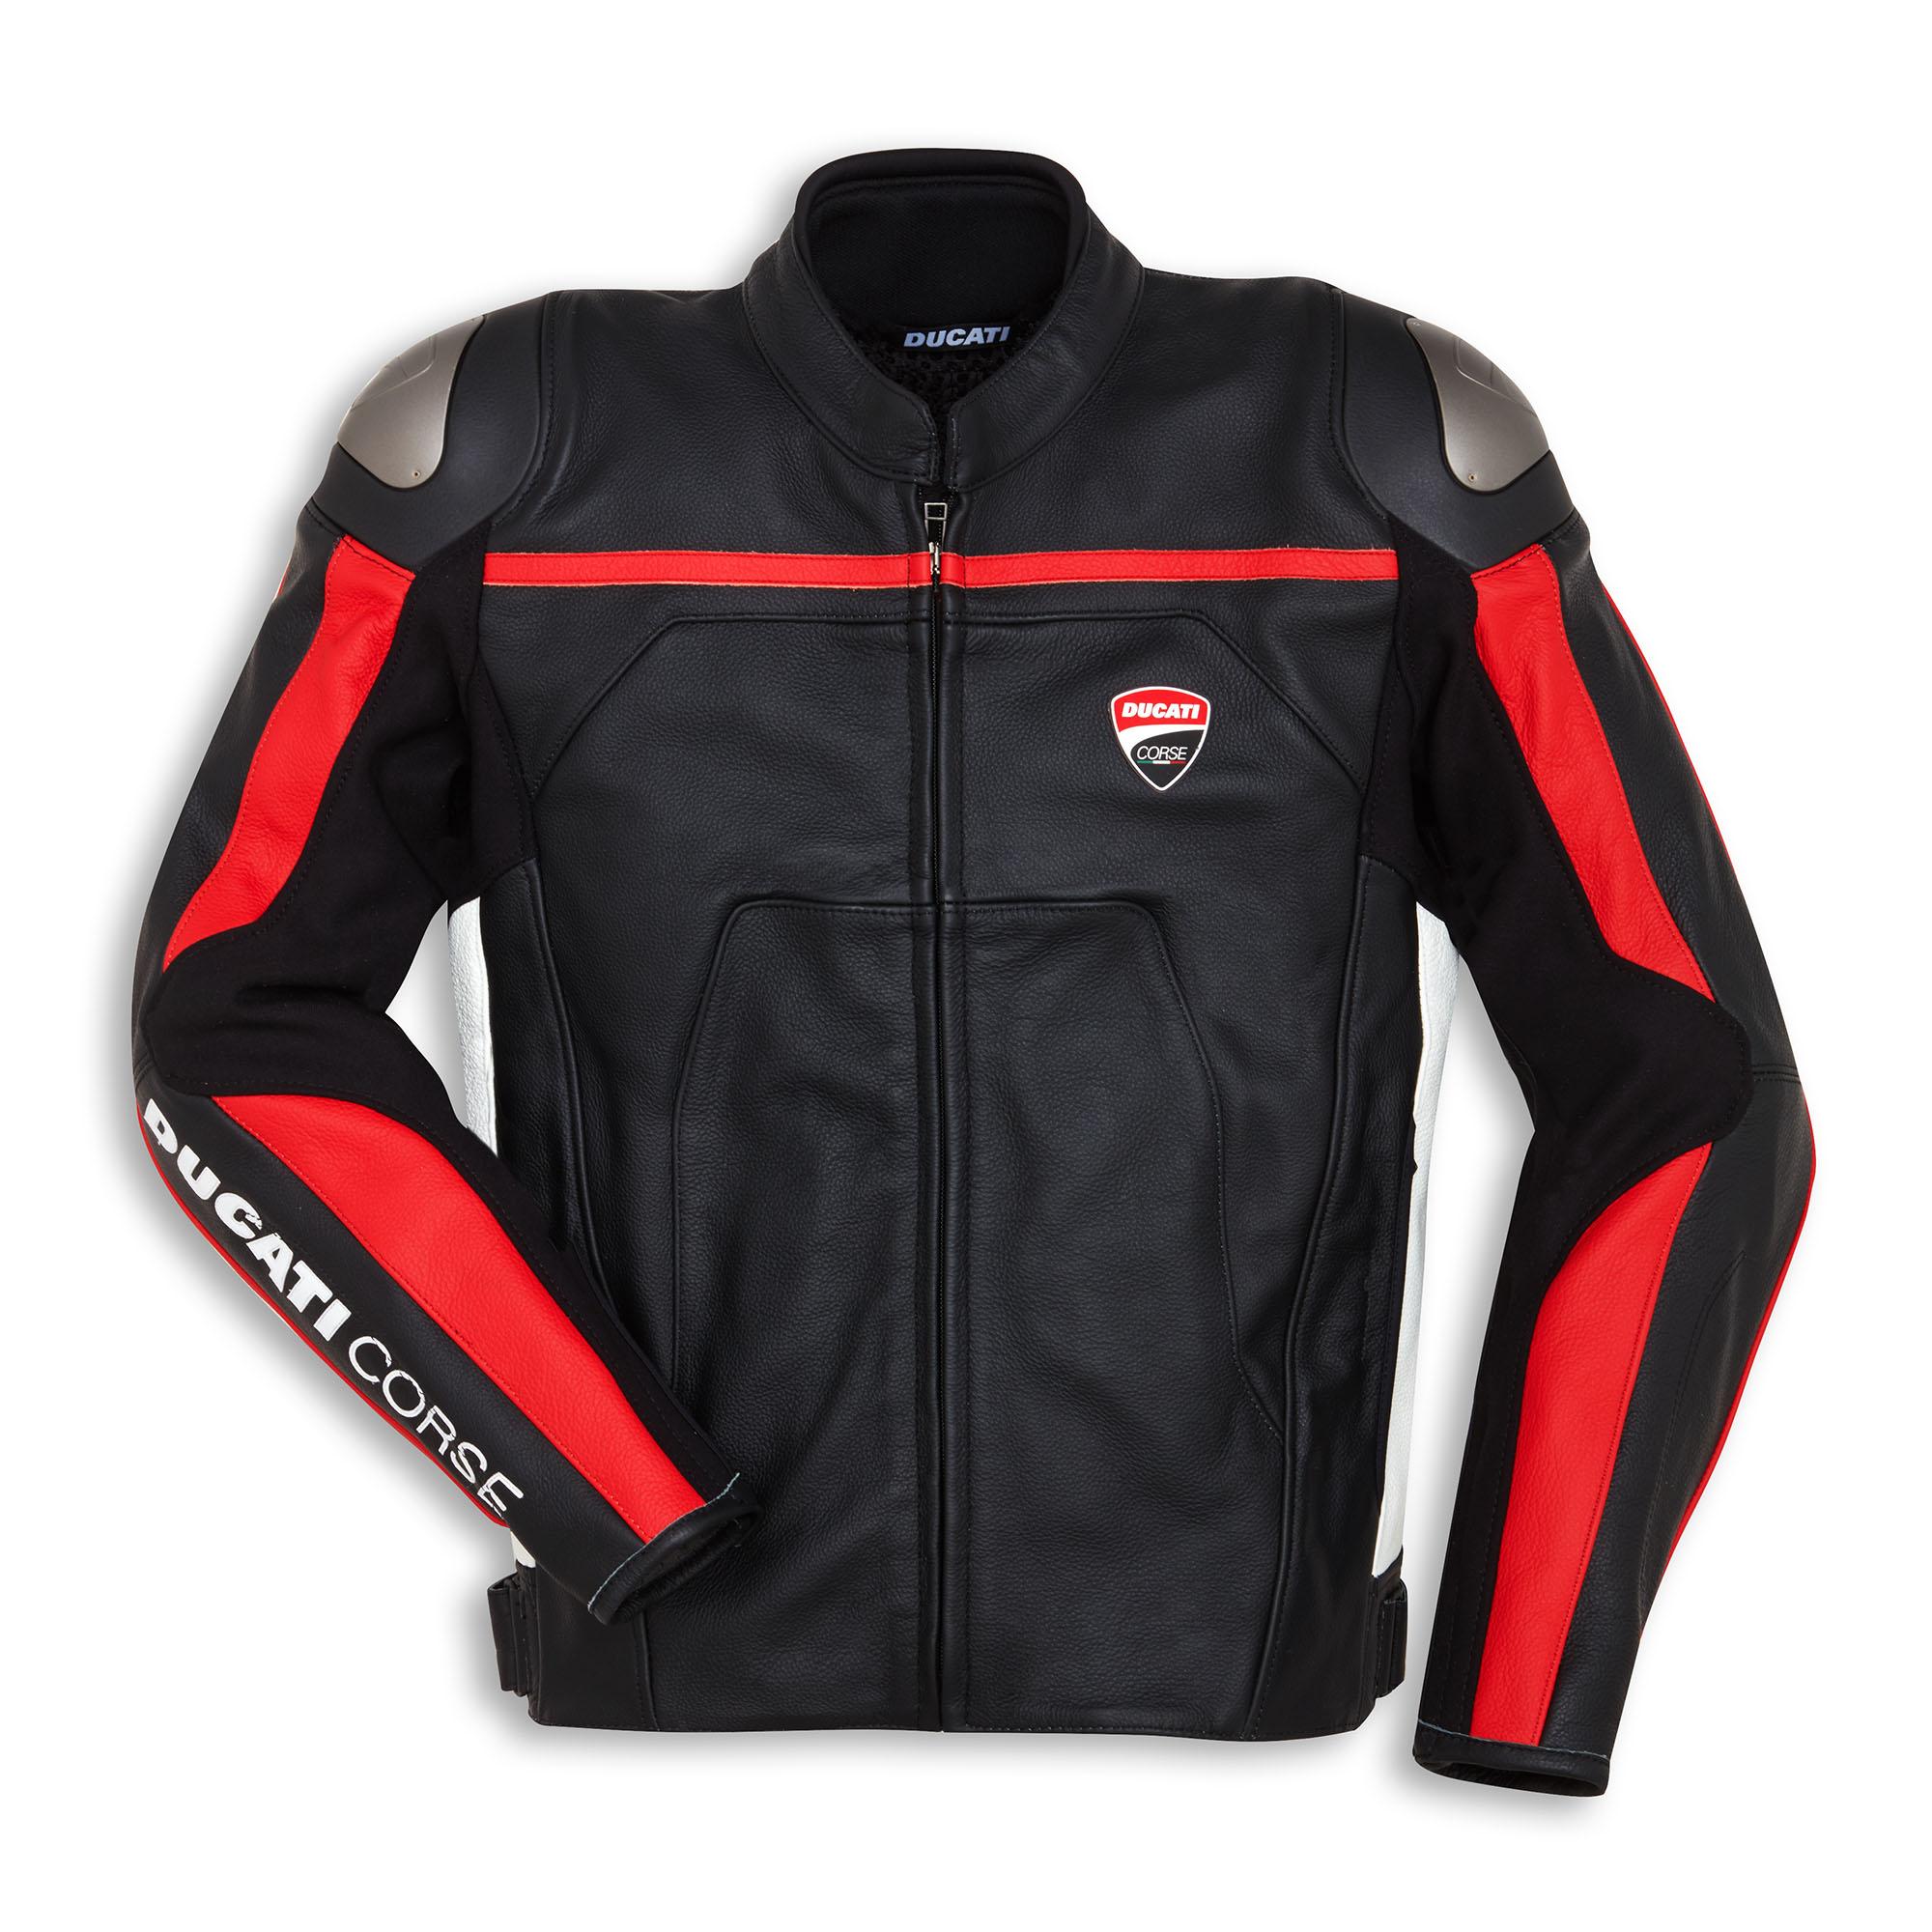 Ducati Corse C4 Leather jacket 981045448